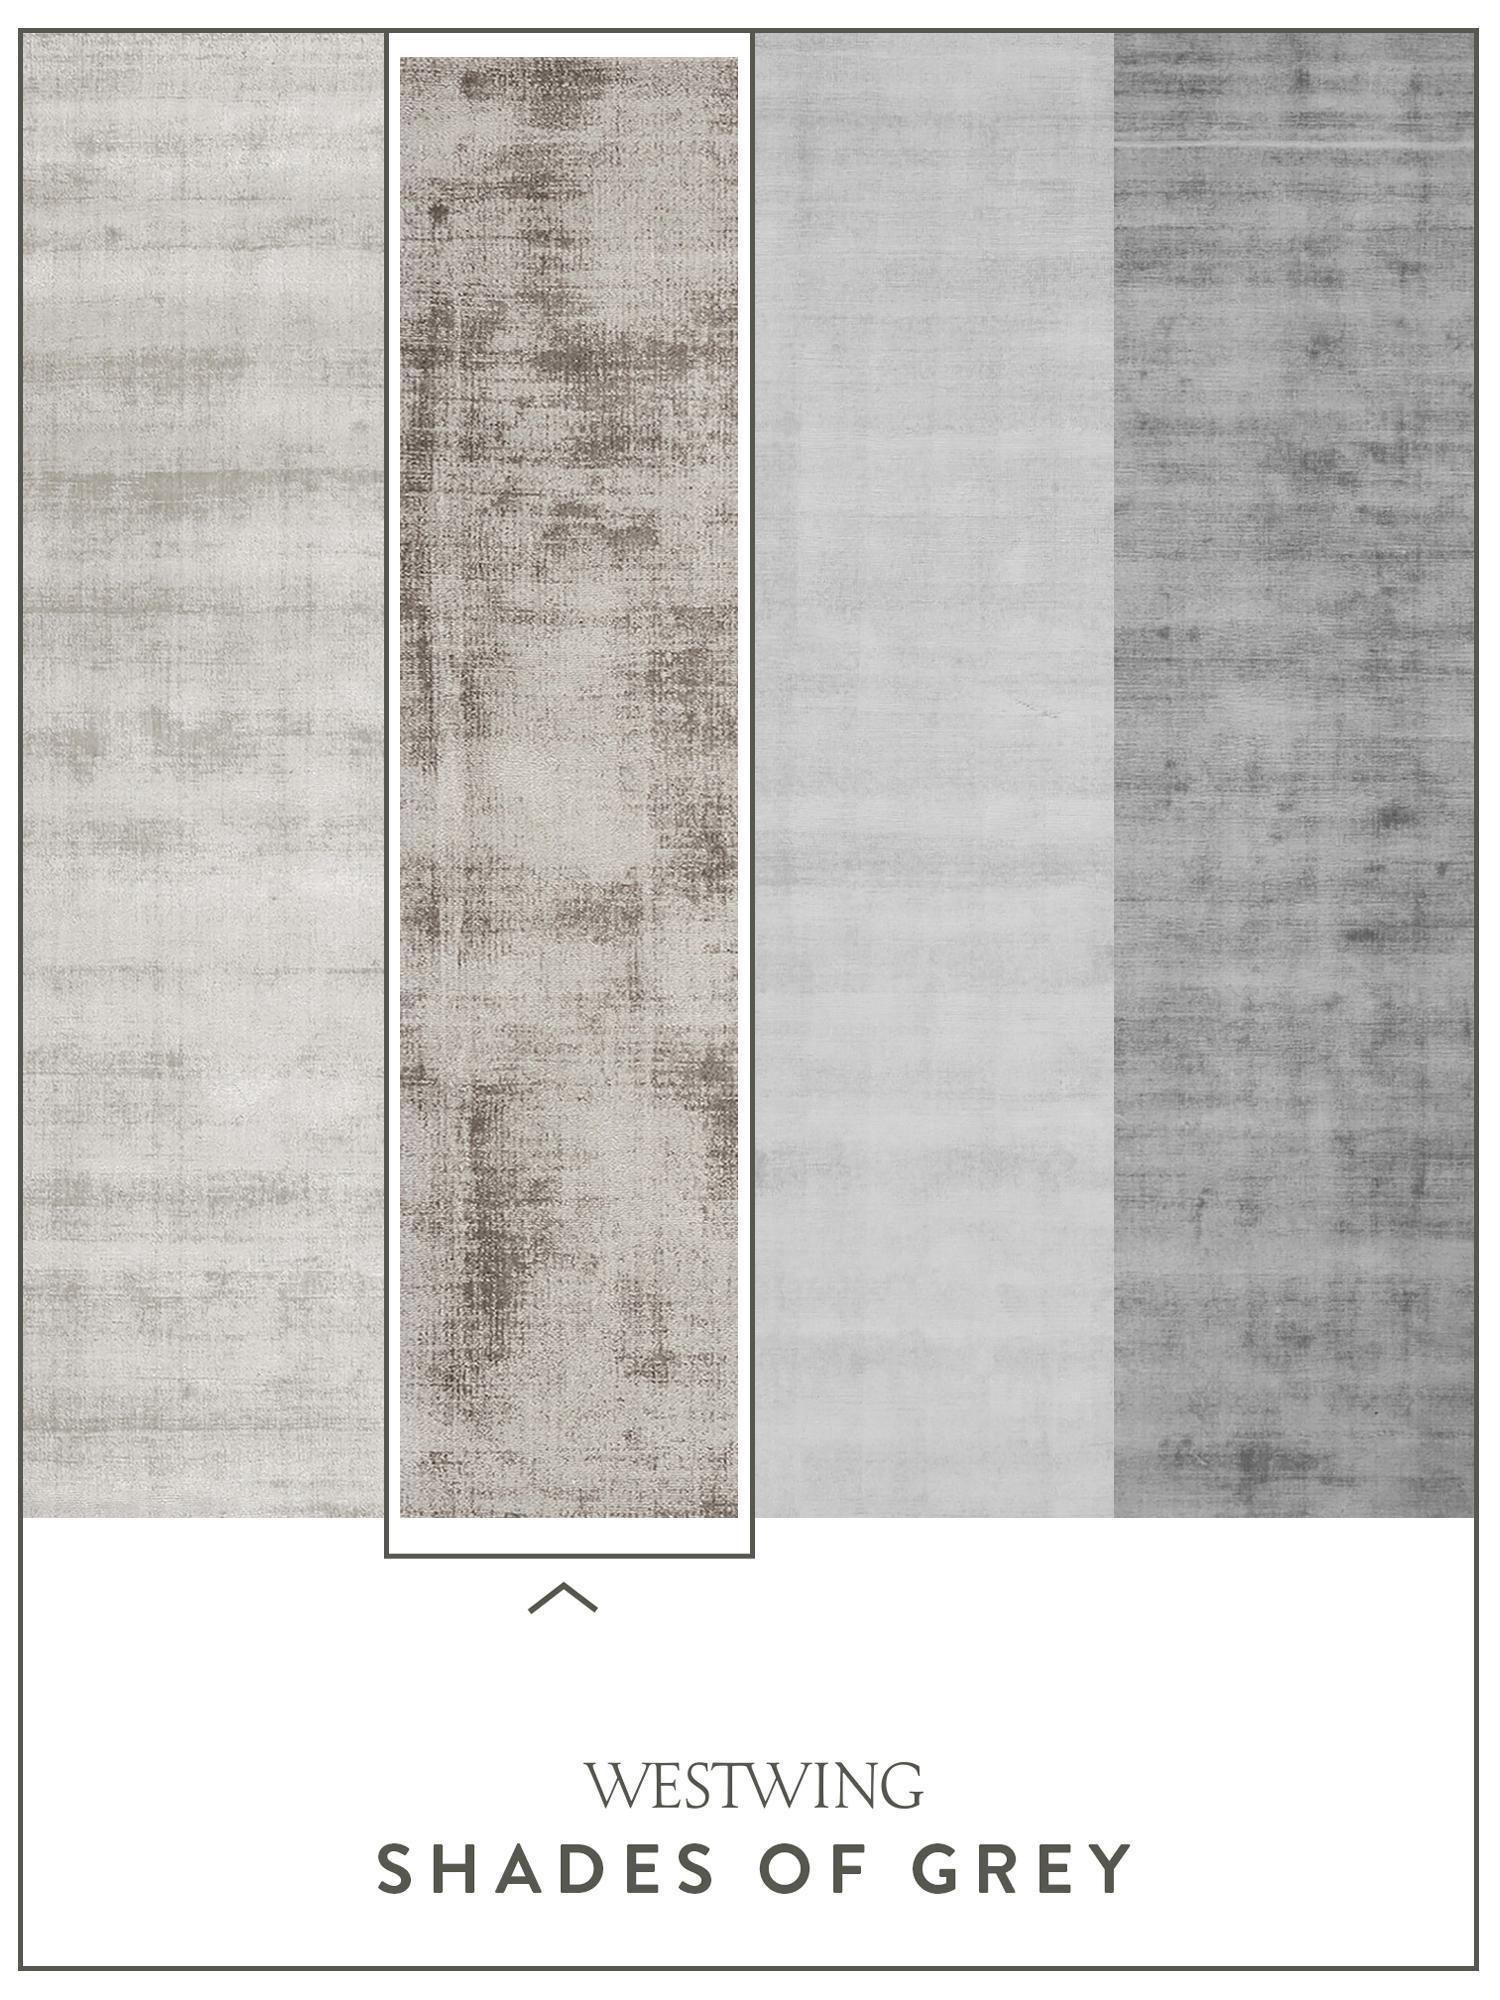 Handgewebter Viskoseteppich Jane in Taupe, Flor: 100% Viskose, Taupe, B 120 x L 180 cm (Größe S)